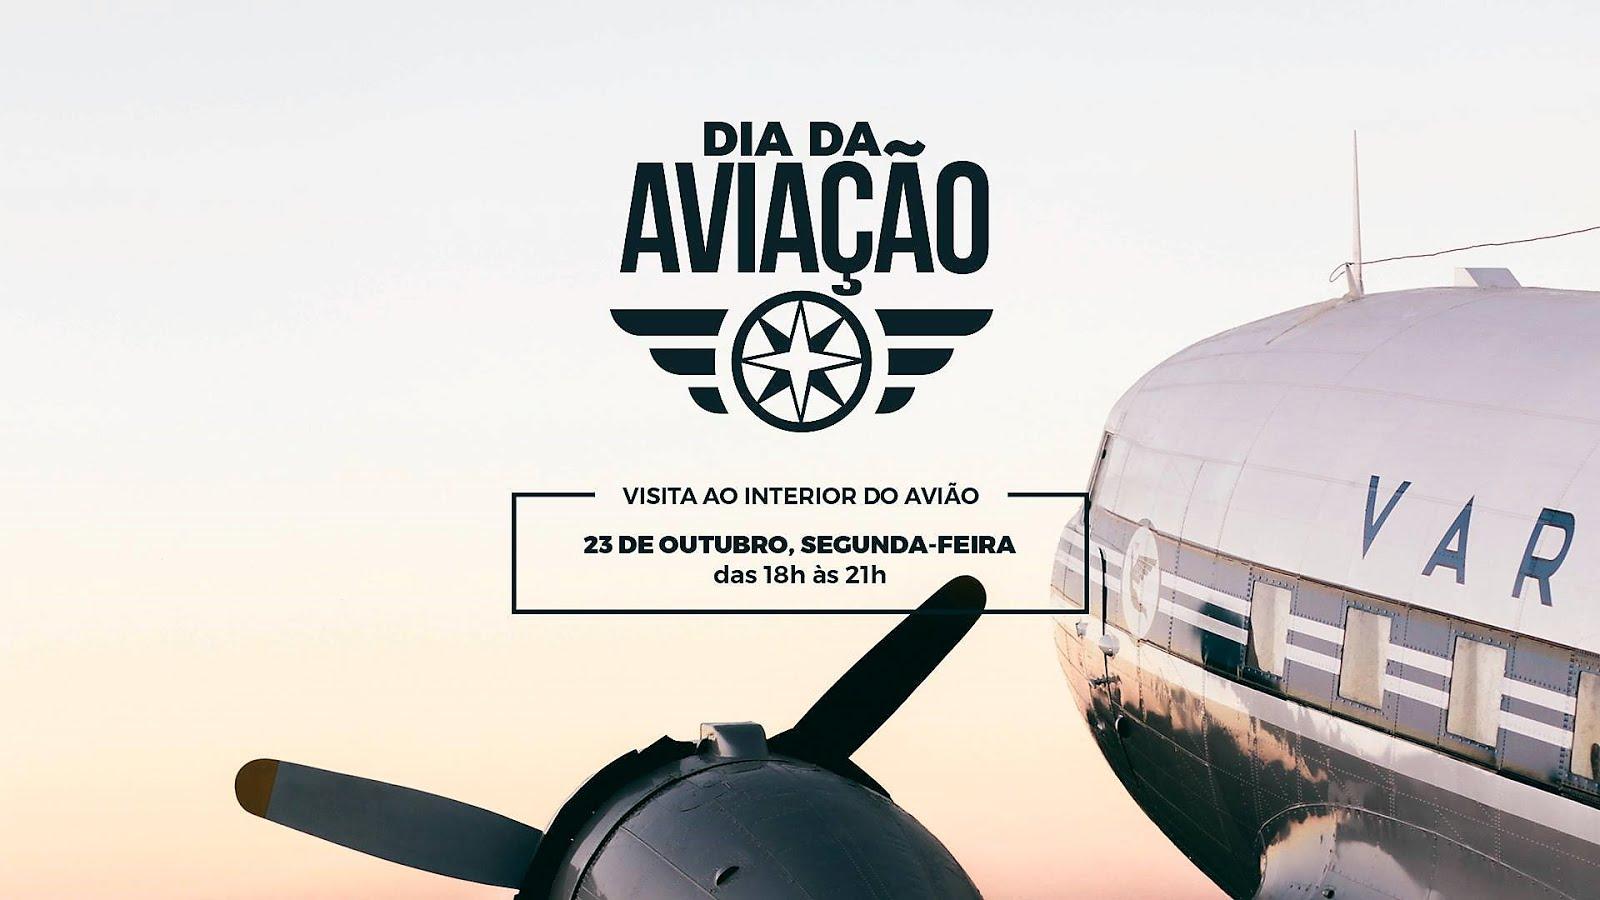 23 de outubro, 18h: Porto Alegre